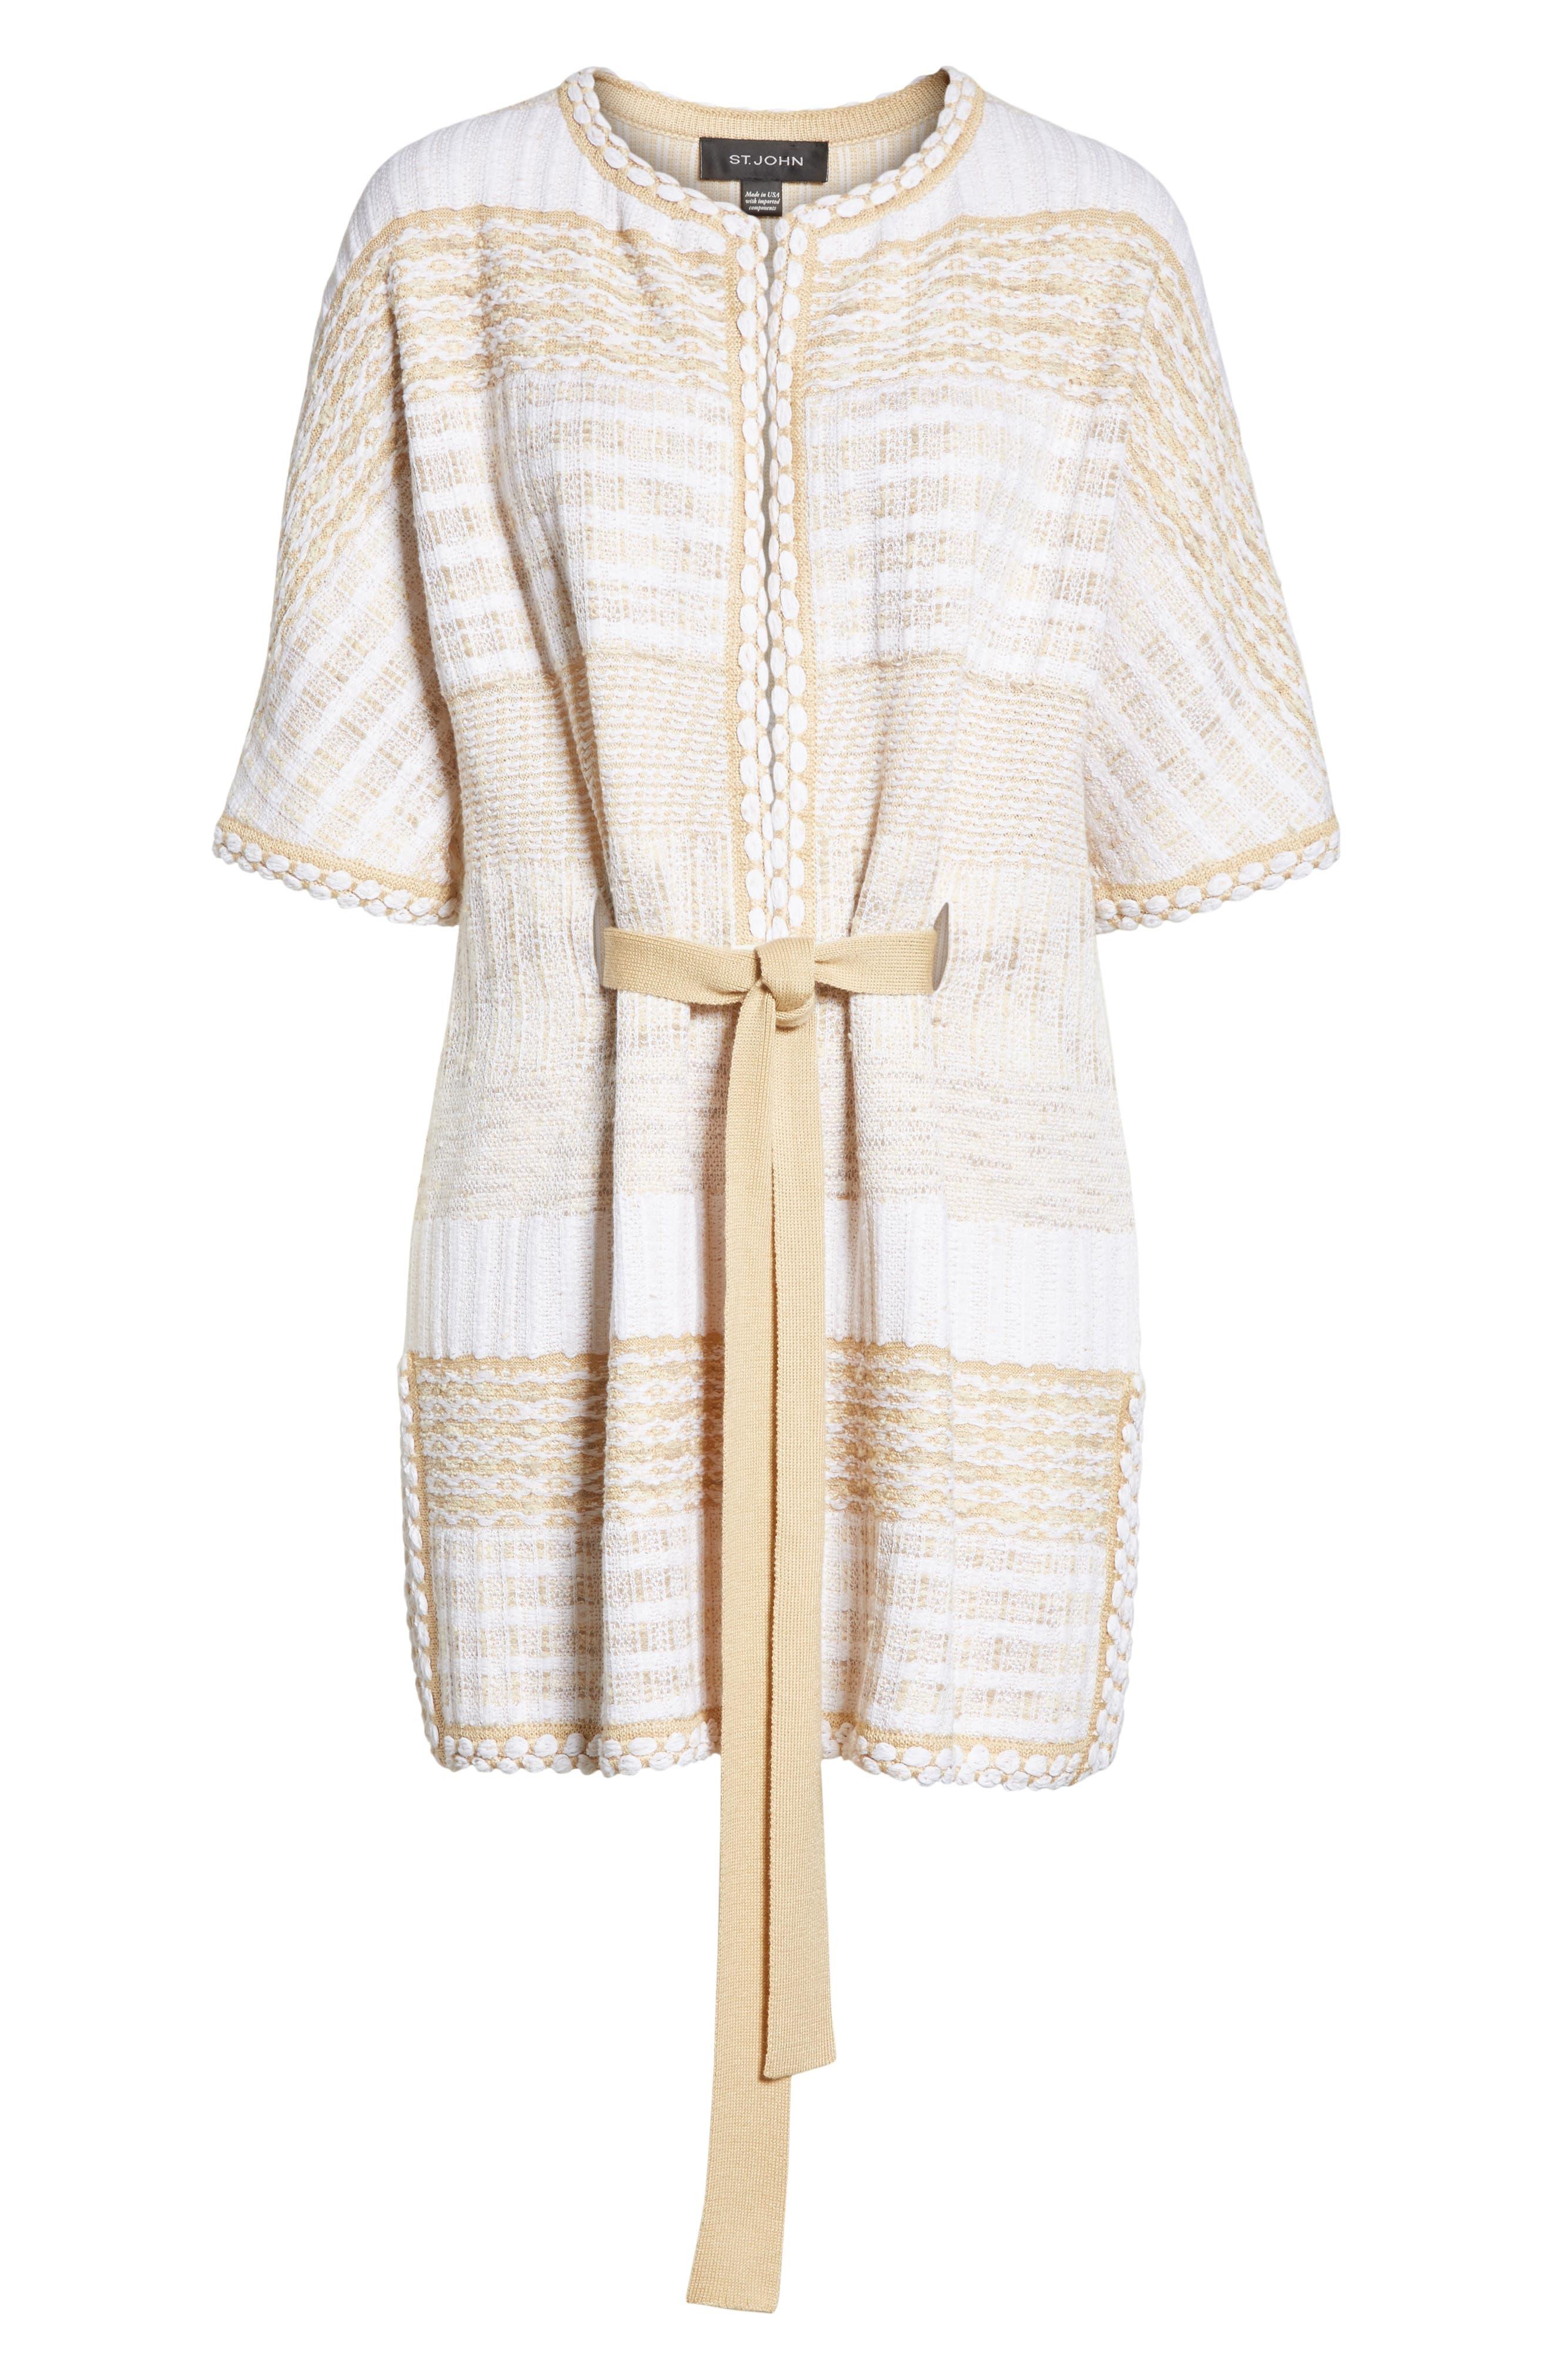 ST. JOHN COLLECTION,                             Mixed Floats Stripe Knit Jacket,                             Alternate thumbnail 5, color,                             700